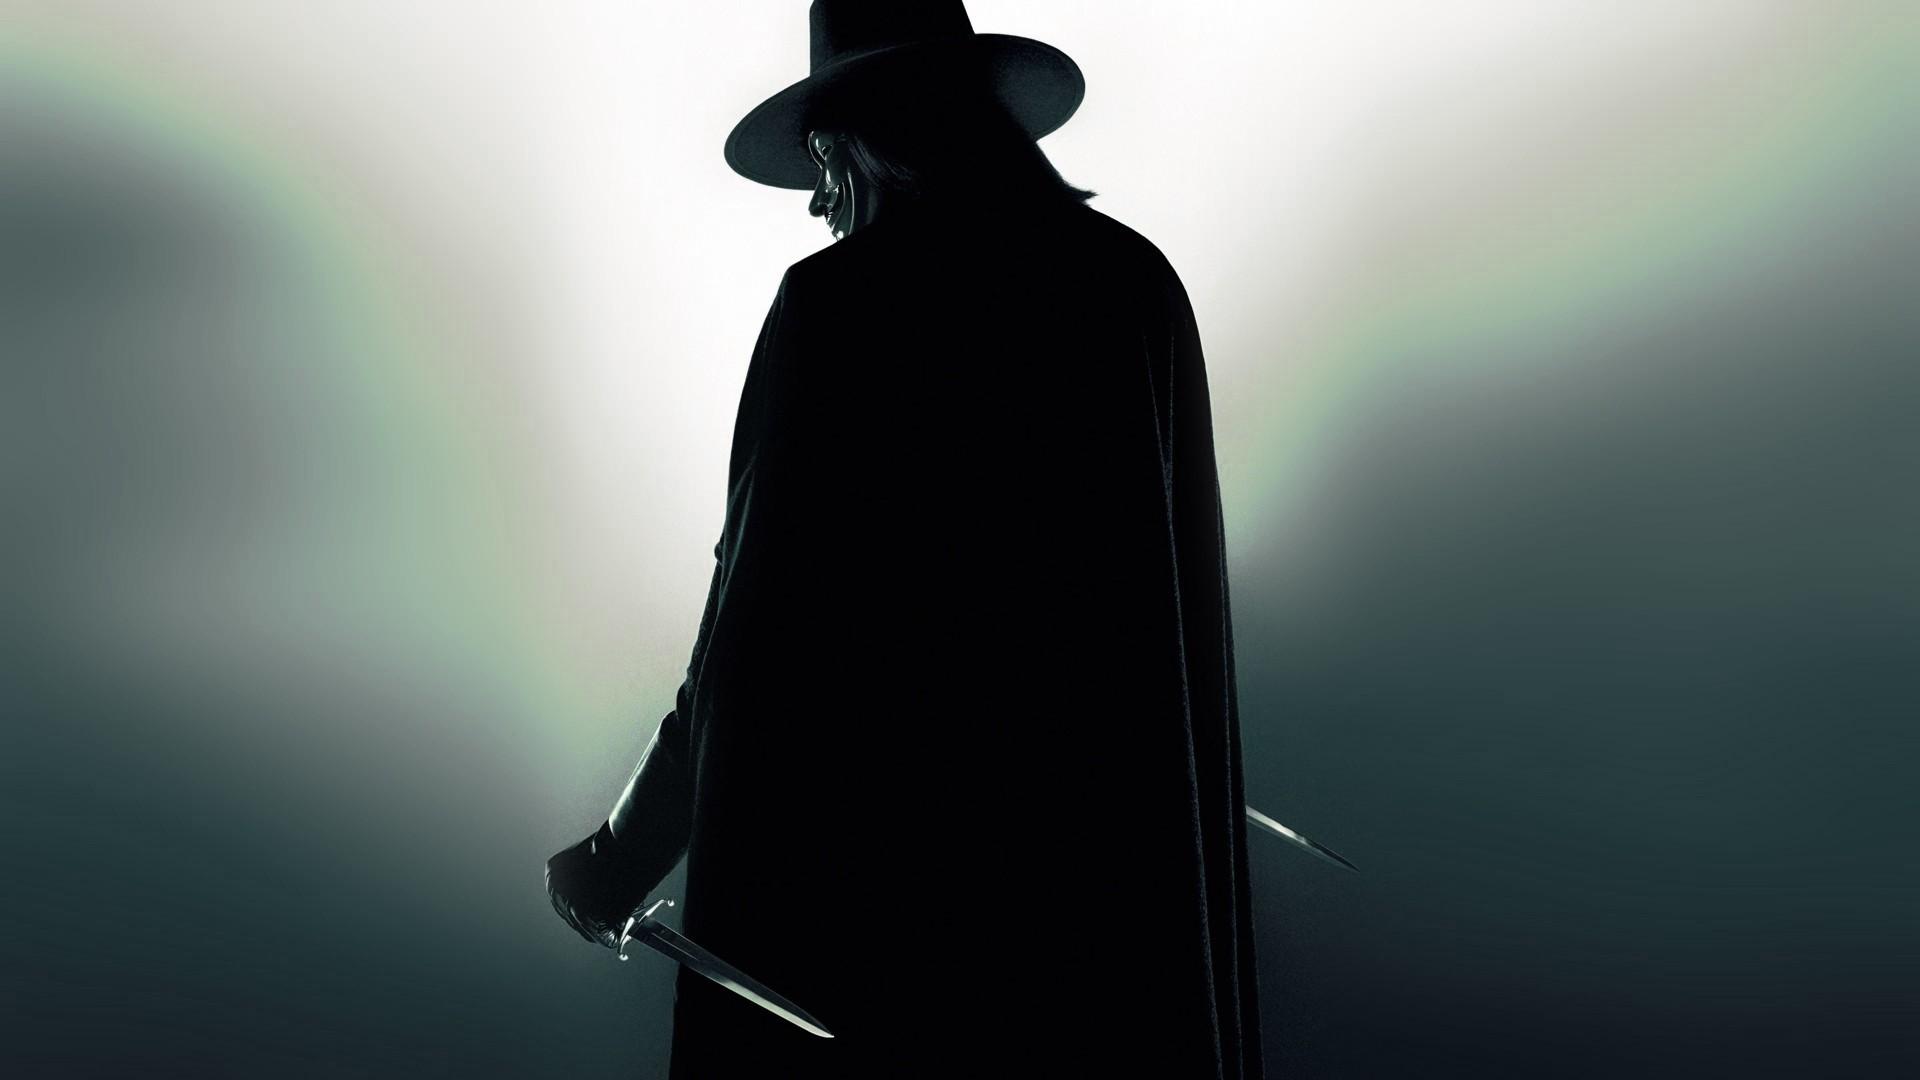 Wallpaper Black Monochrome Silhouette Movies Dagger V